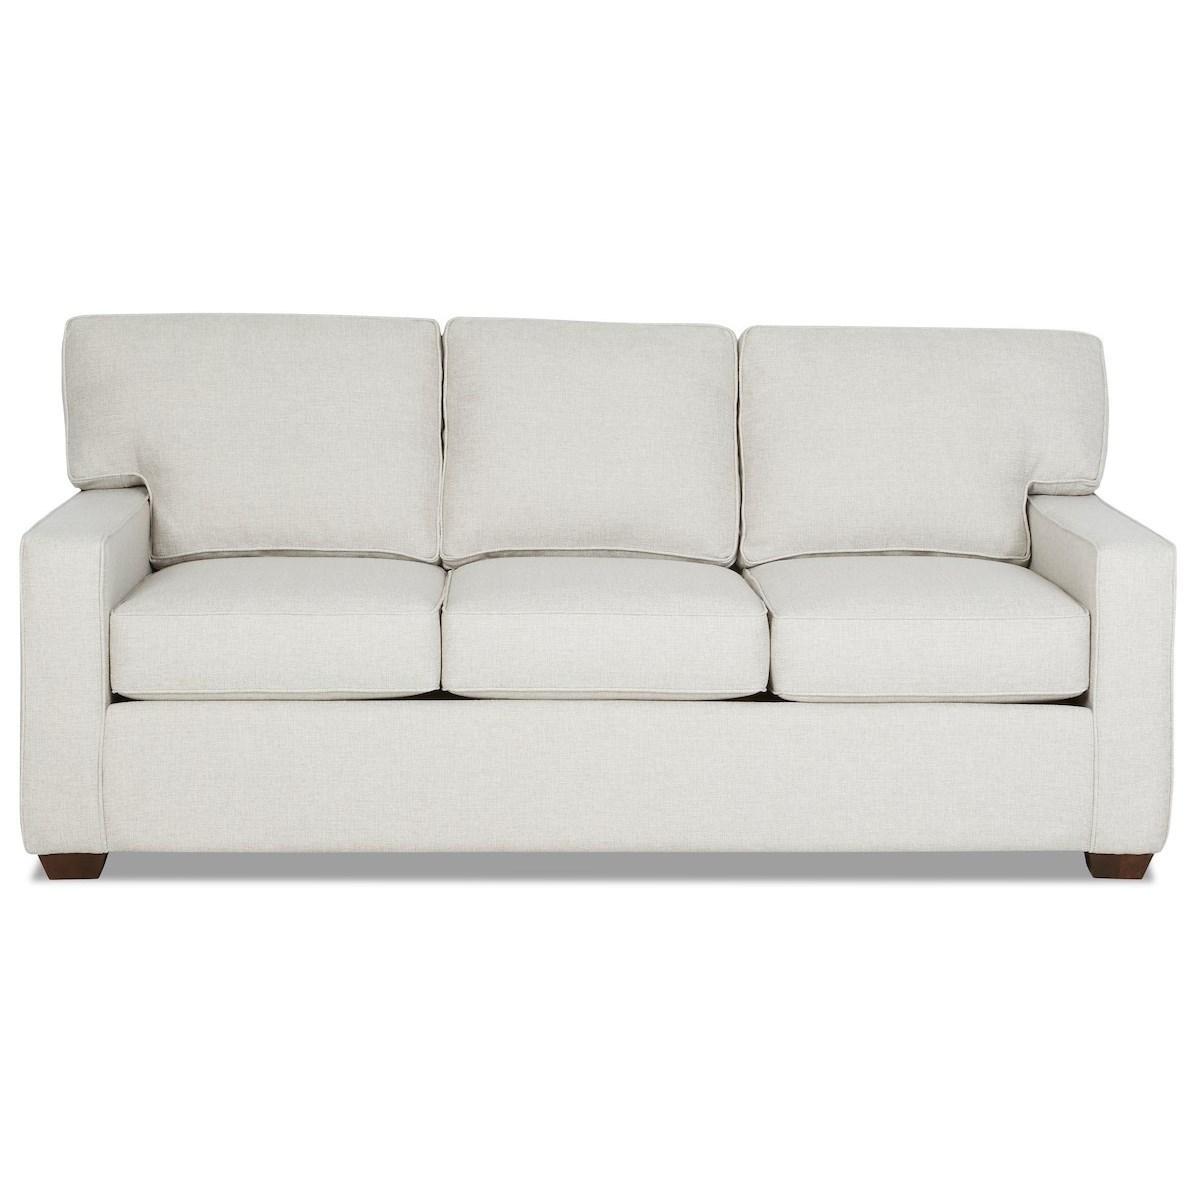 Selection Sofa by Klaussner at Pilgrim Furniture City